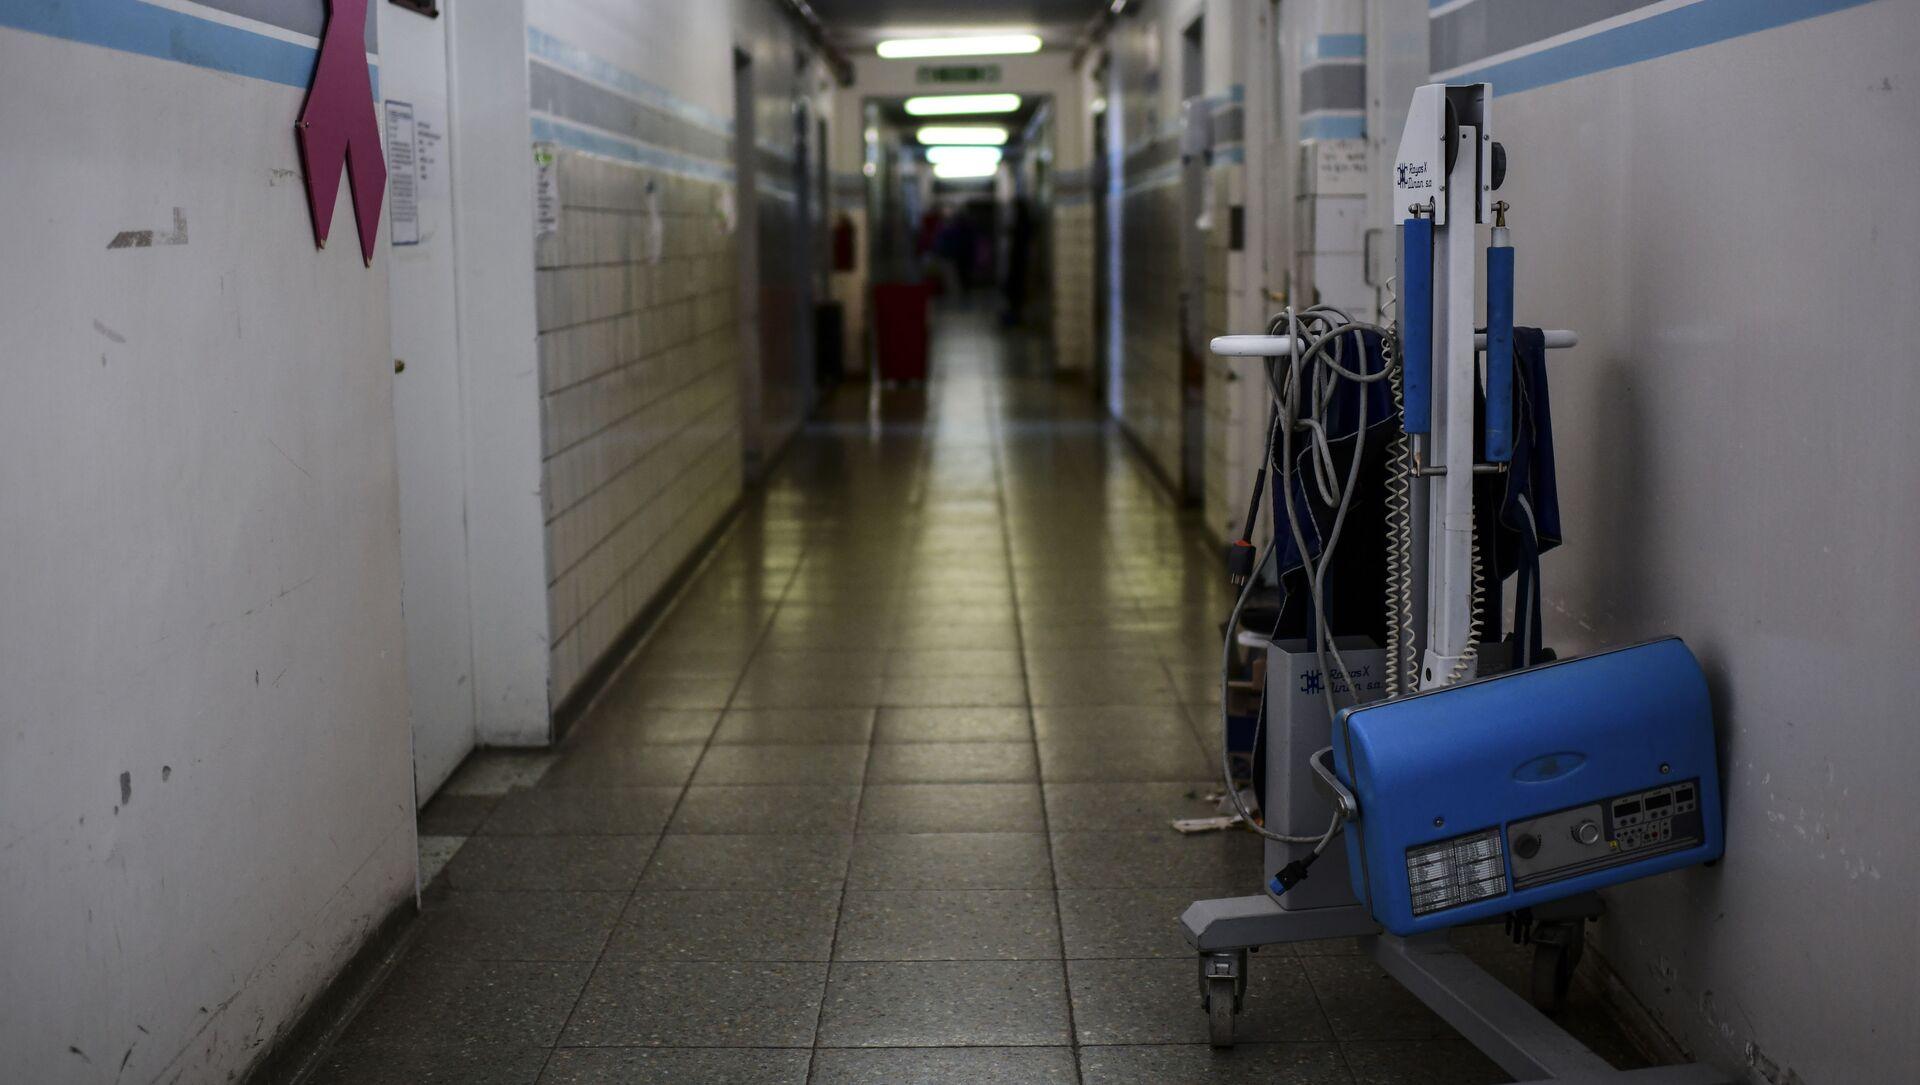 Un hospital en Argentina  - Sputnik Mundo, 1920, 08.05.2020